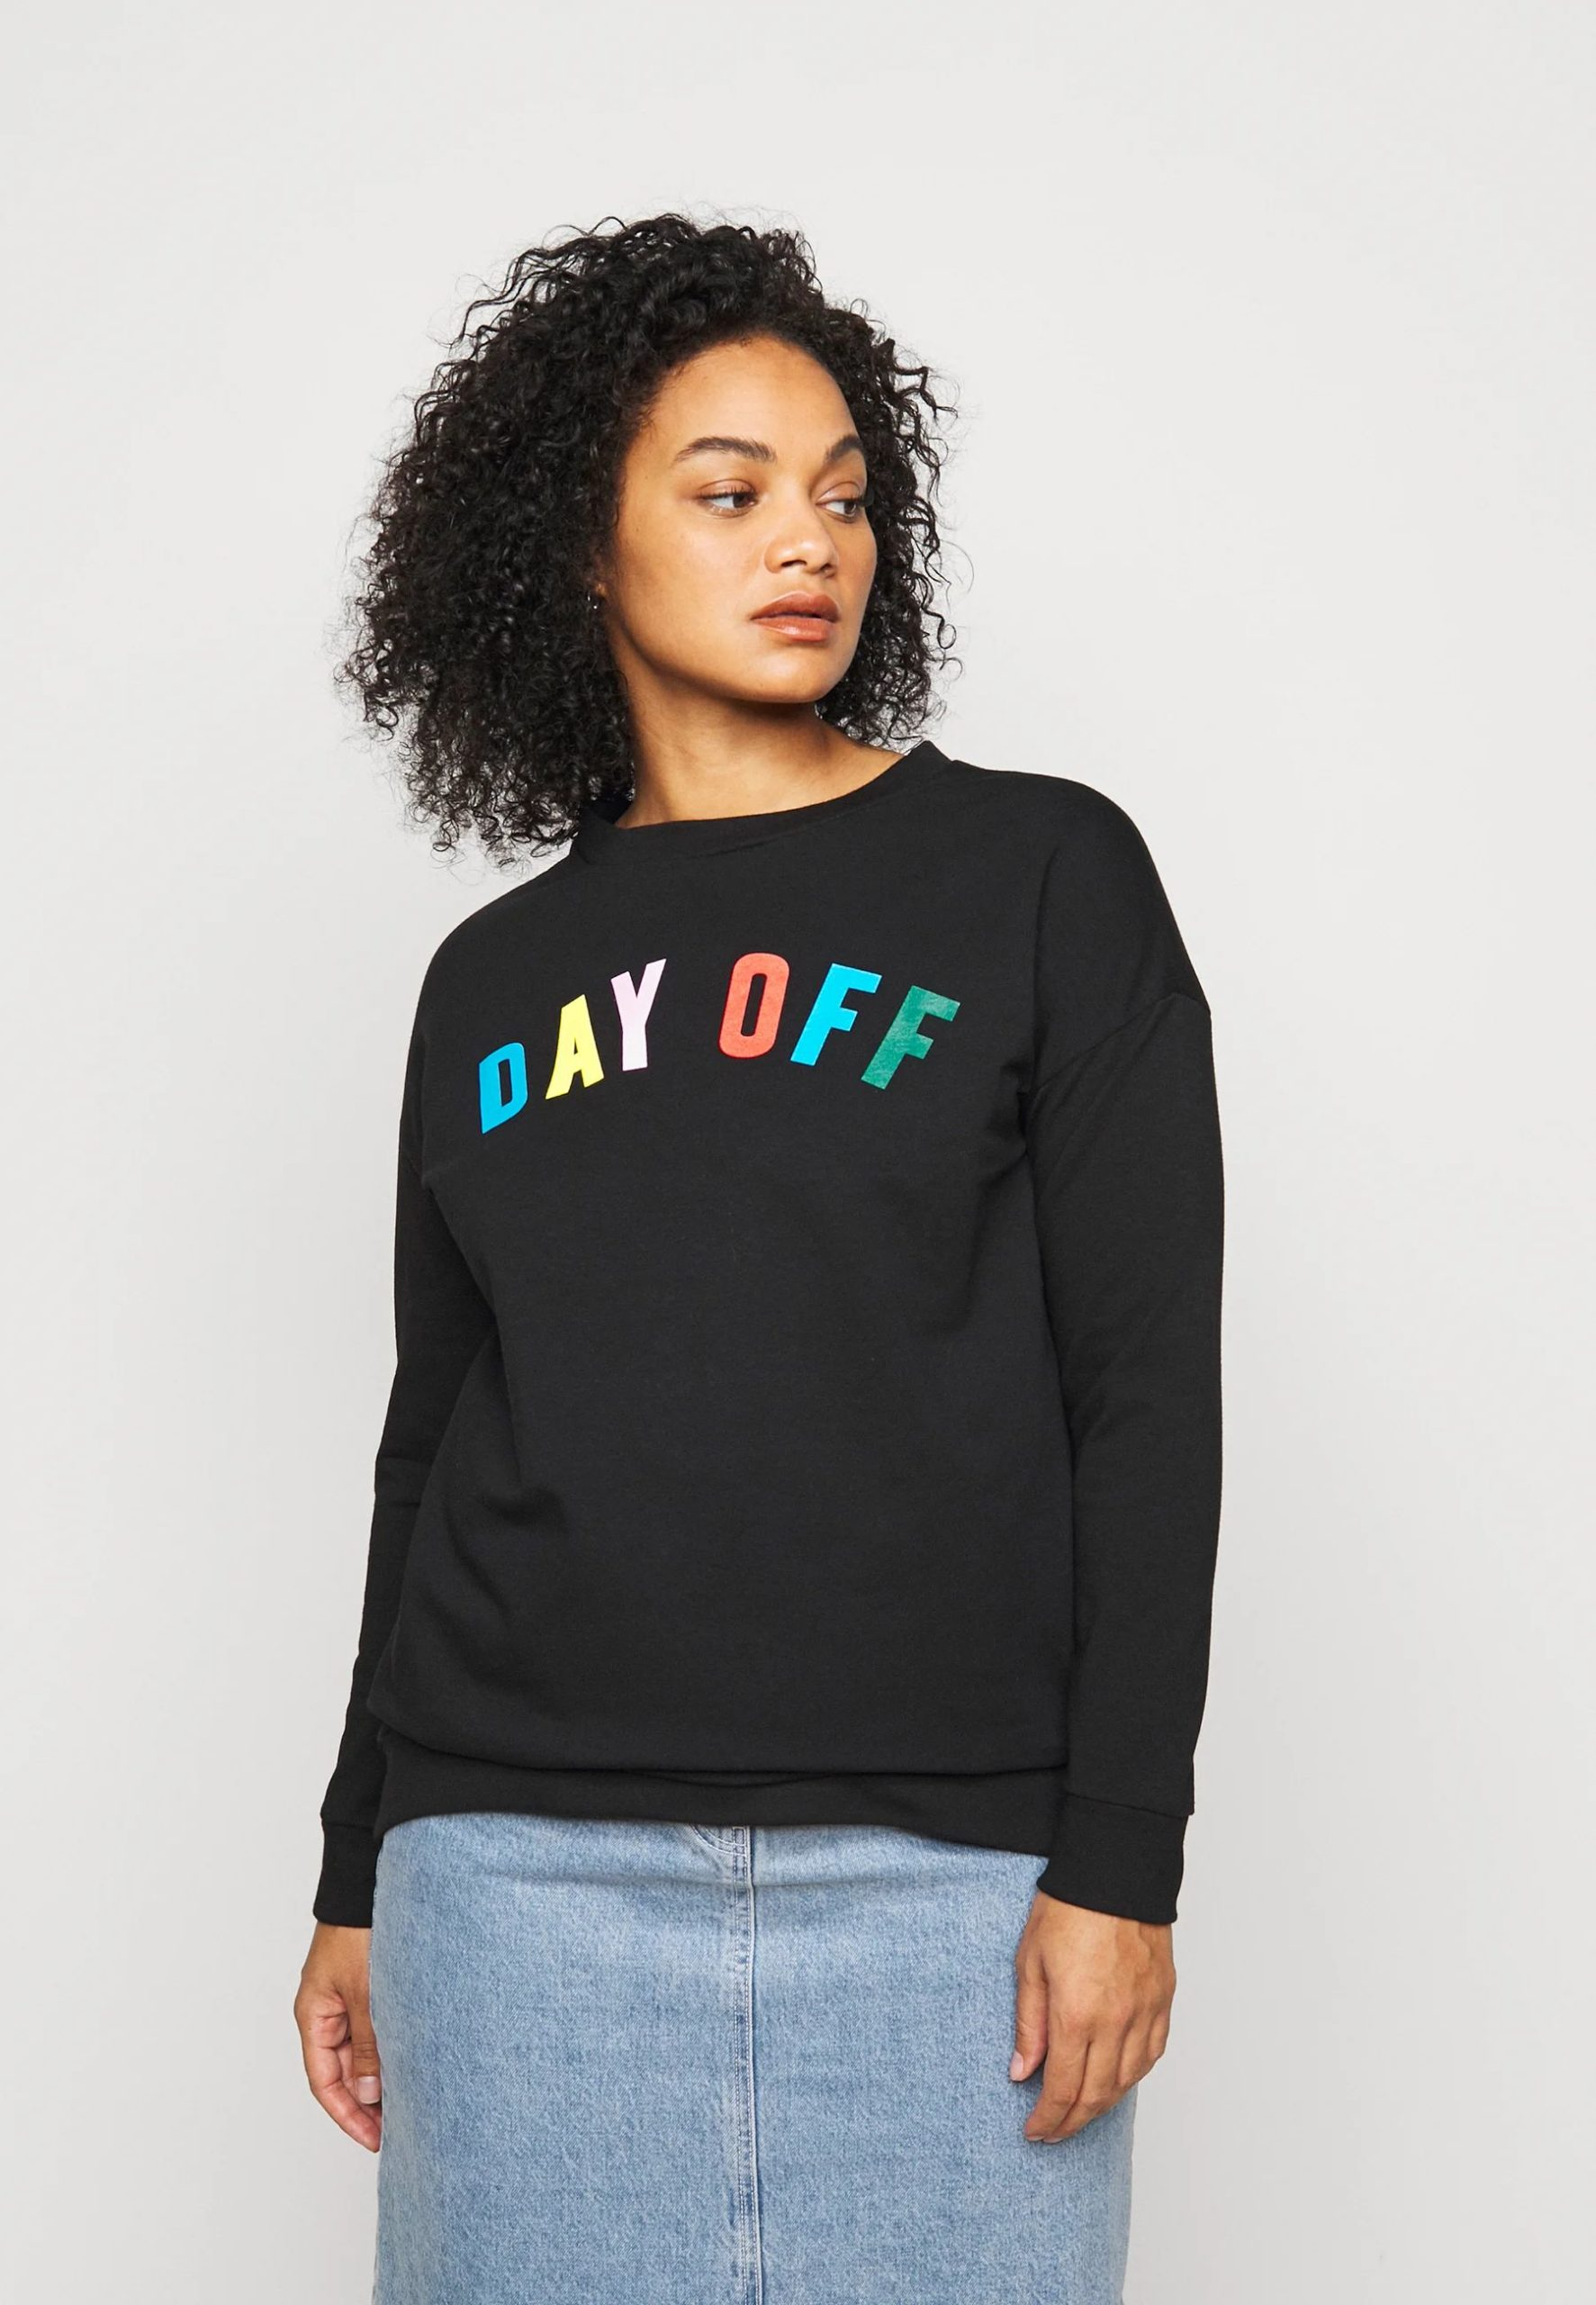 DAY OFF - Sweatshirt